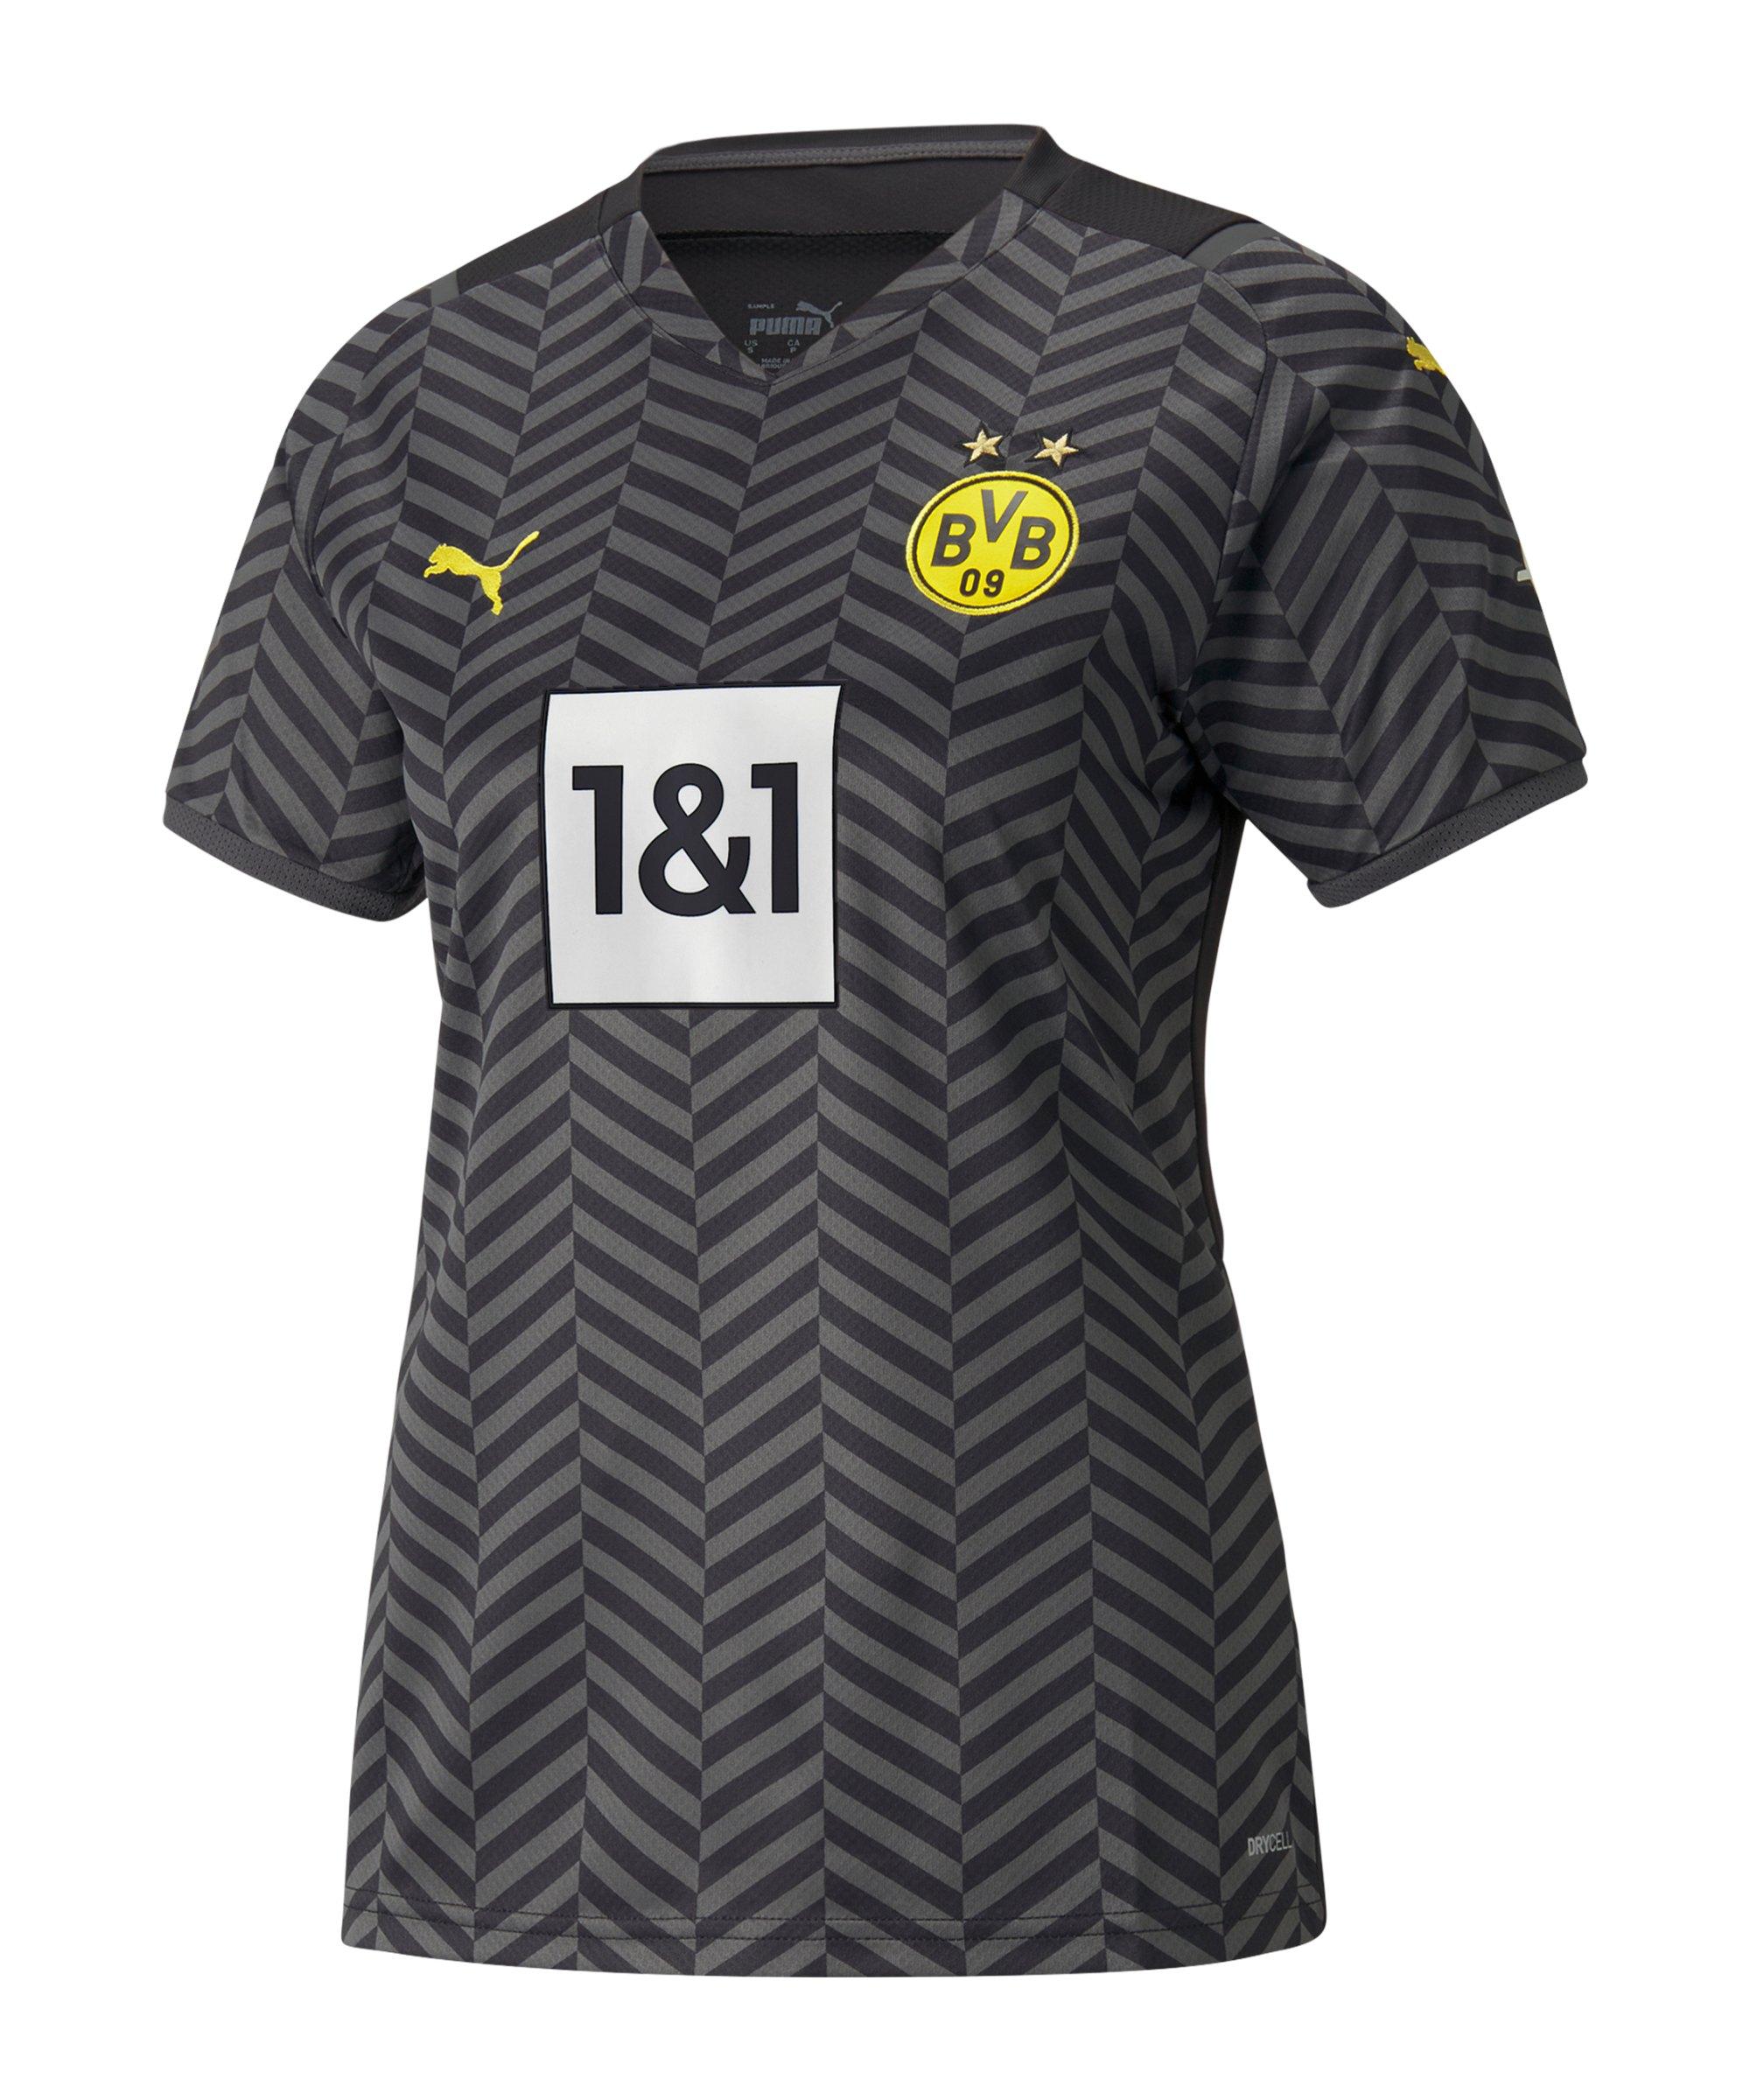 PUMA BVB Dortmund Trikot Away 2021/2022 Damen Grau F04 - grau